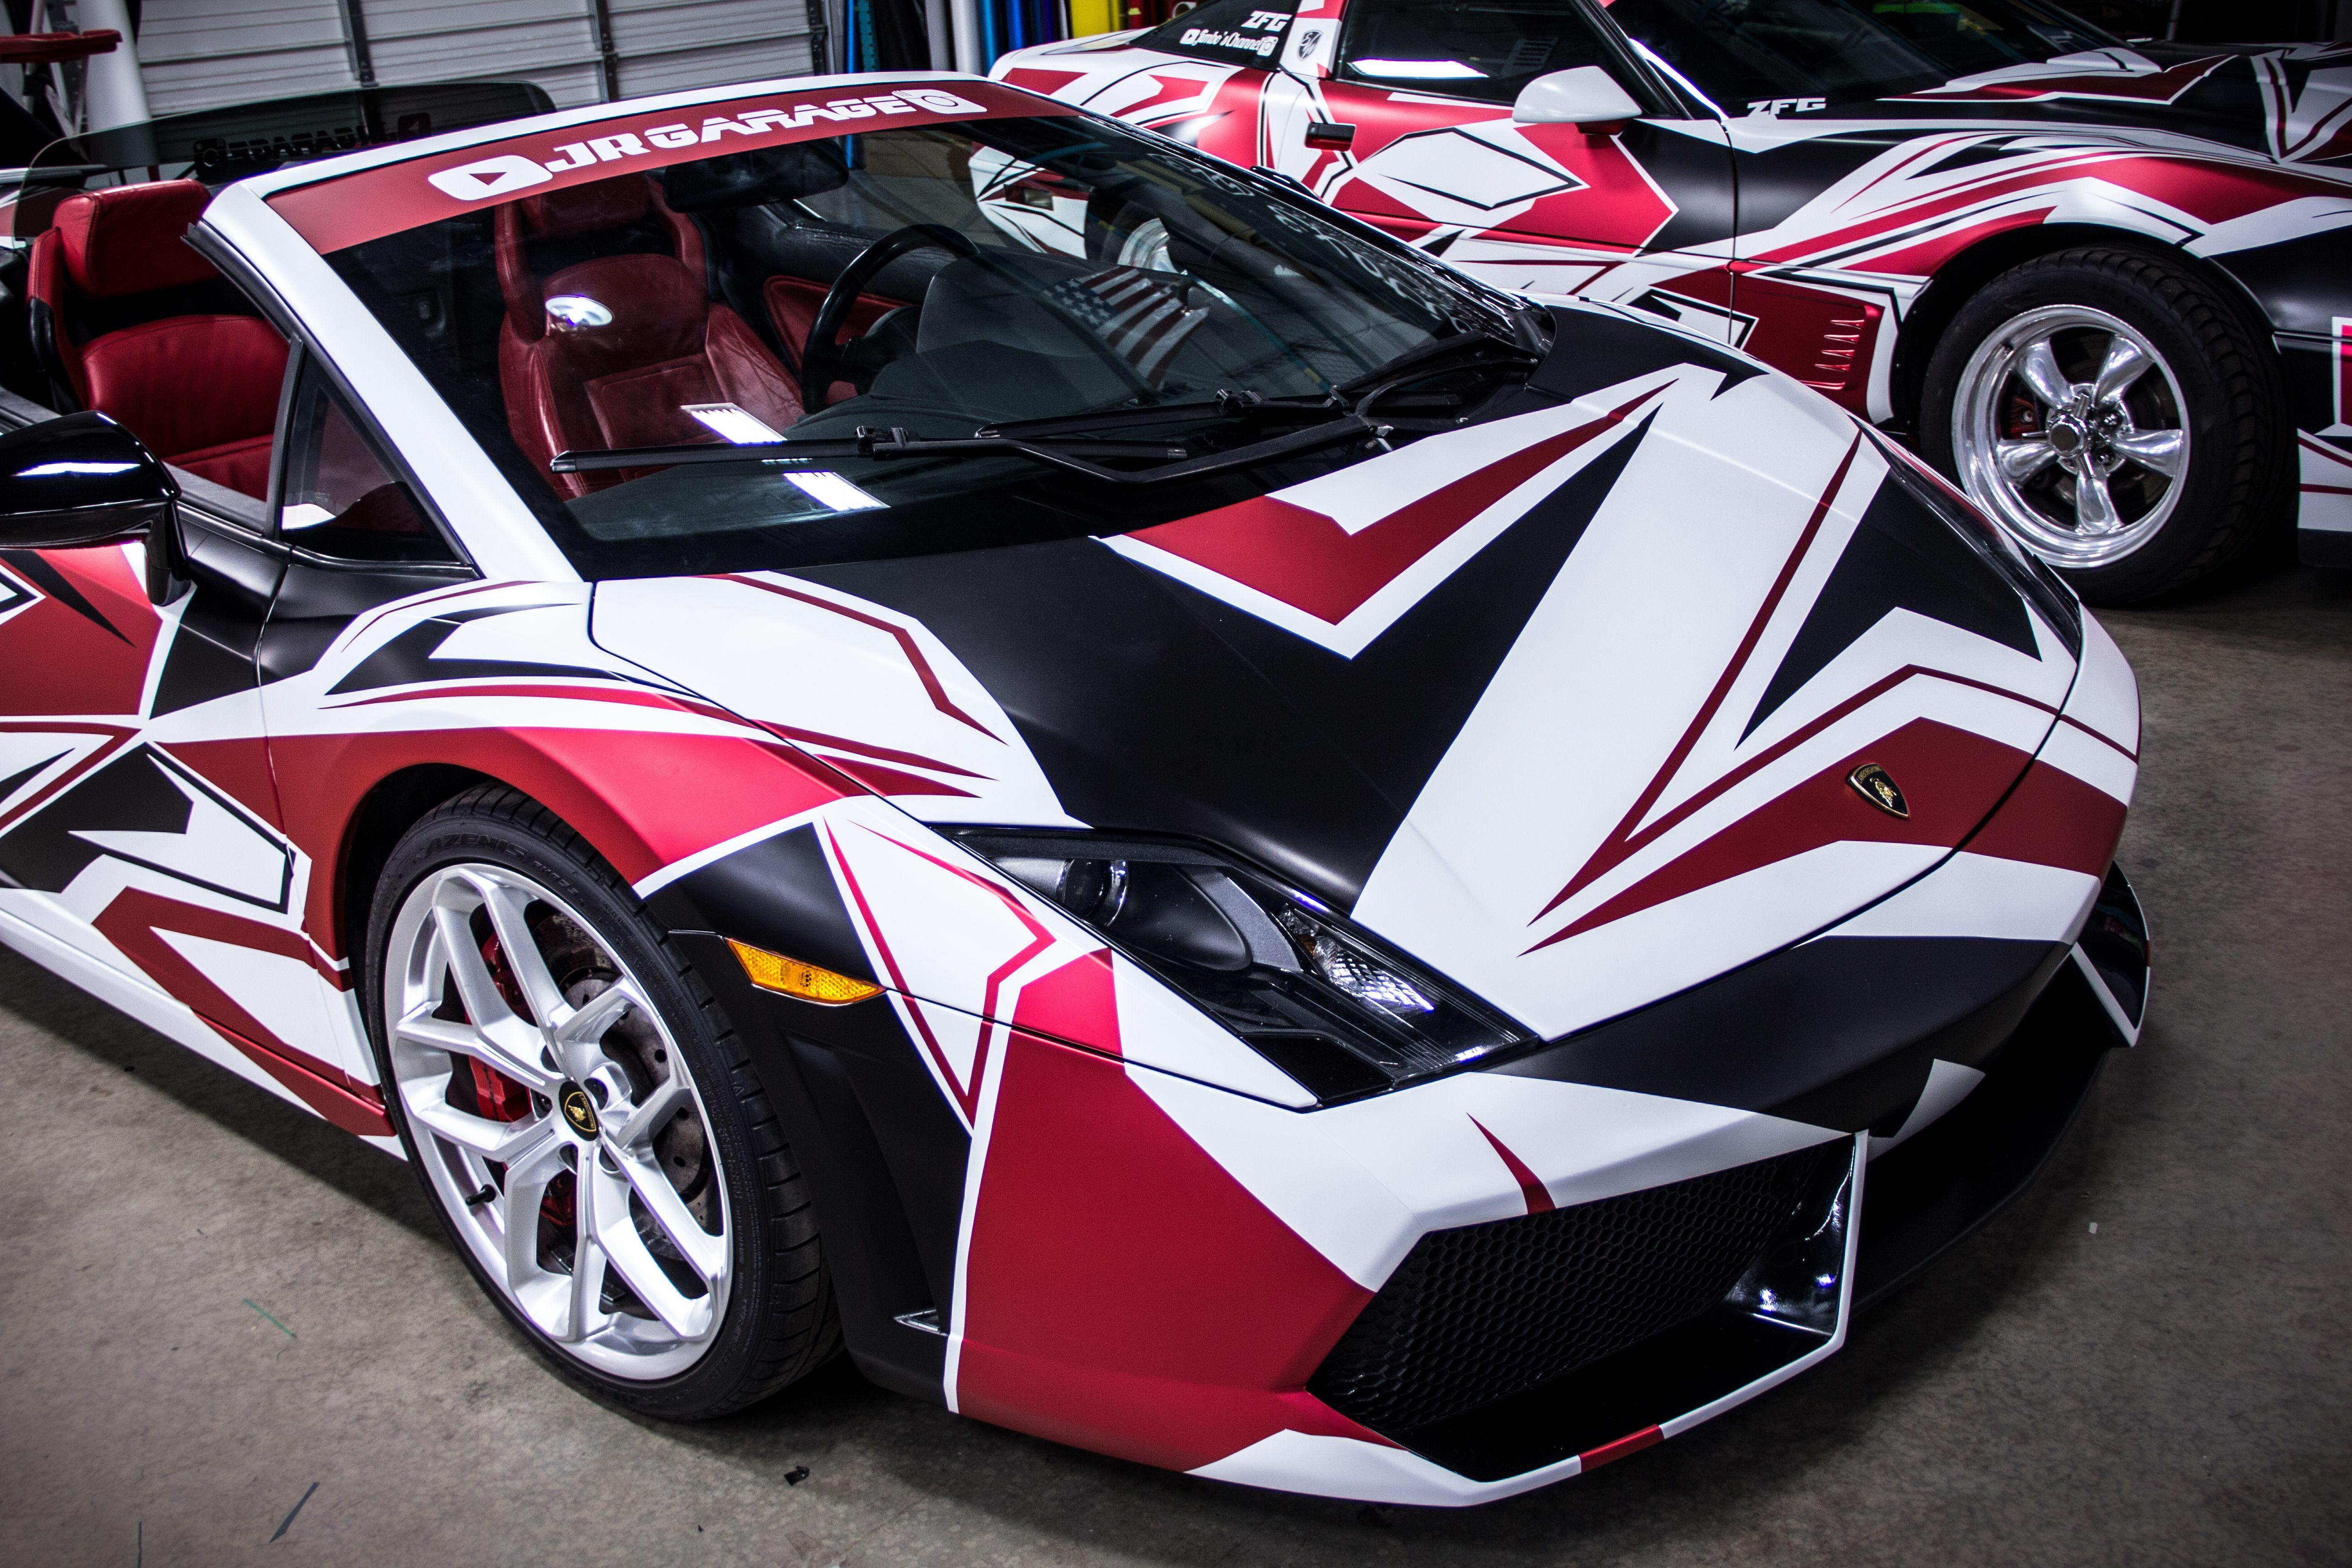 Custom Gallardo Shattered Wrap Car Wrap Car Vinyl Graphics Vinyl Wrap Car